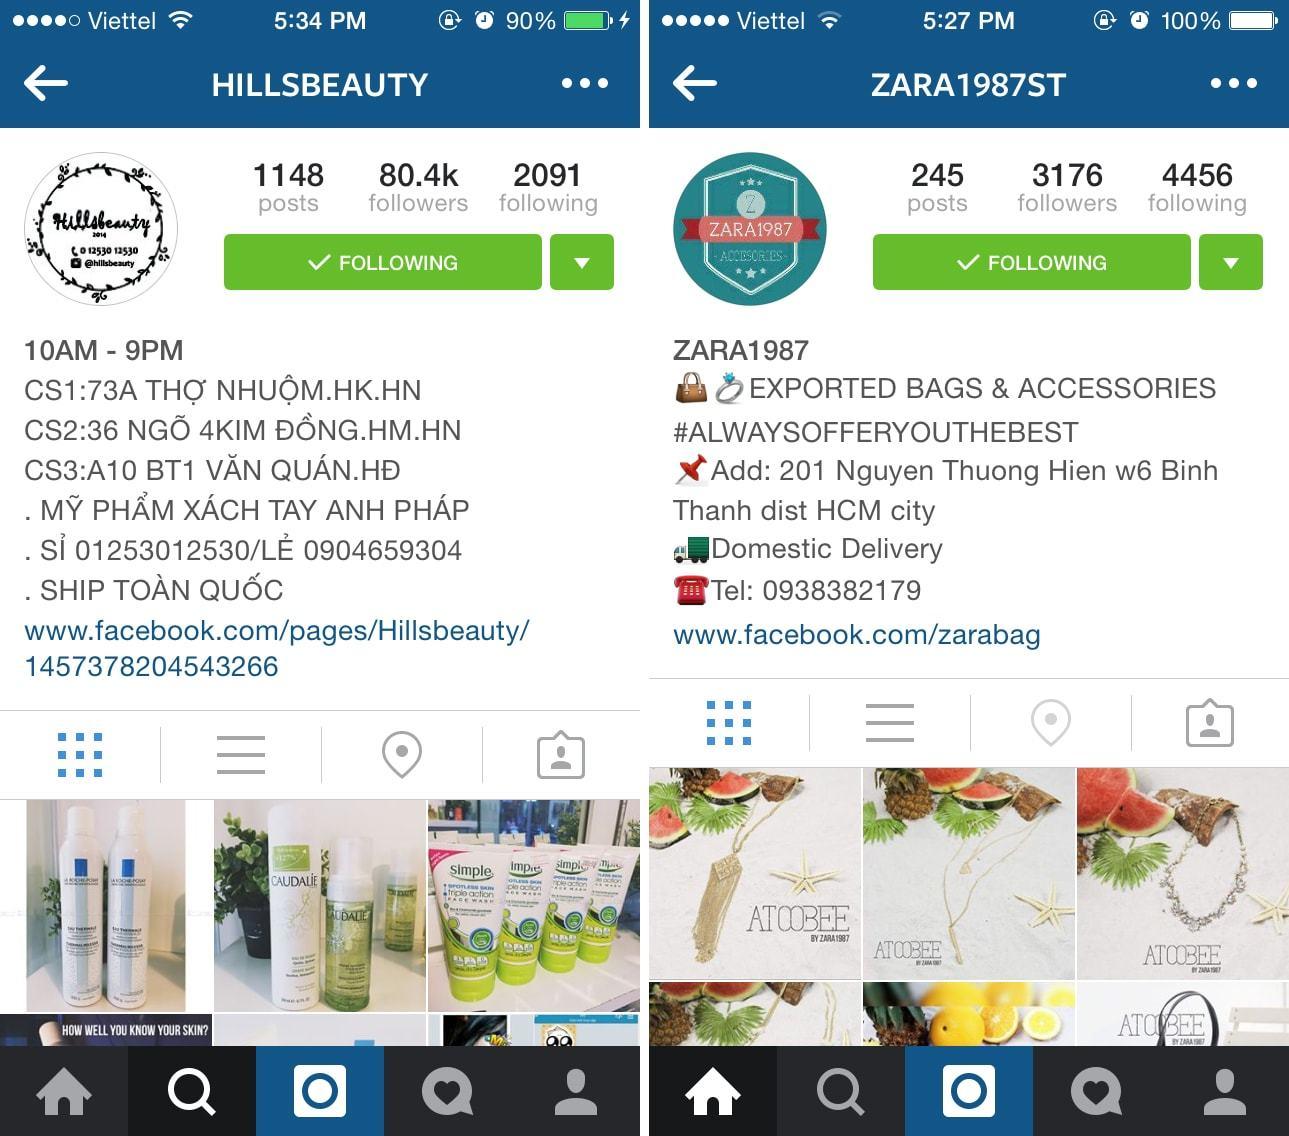 210718 alosoft fhuong dan kinh doanh tren instagram hieu qua6 - Hướng Dẫn Kinh Doanh Trên Instagram: Phần 2 - 5 Kinh Nghiệm Kinh Doanh Hiệu Quả Trên Instagram